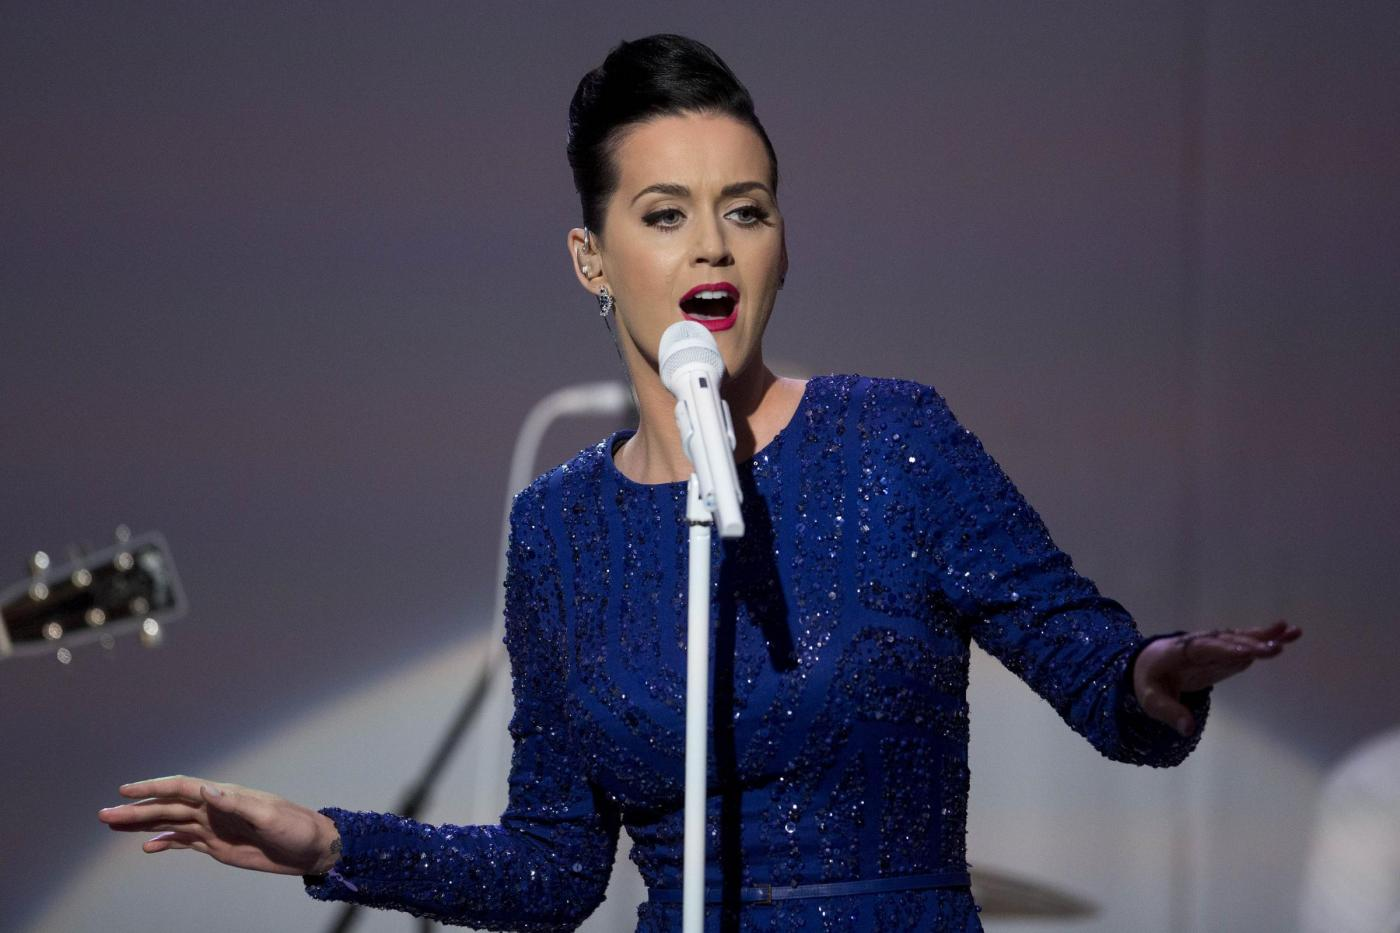 Katy Perry al Super Bowl 2015: canterà durante l'Halftime Show